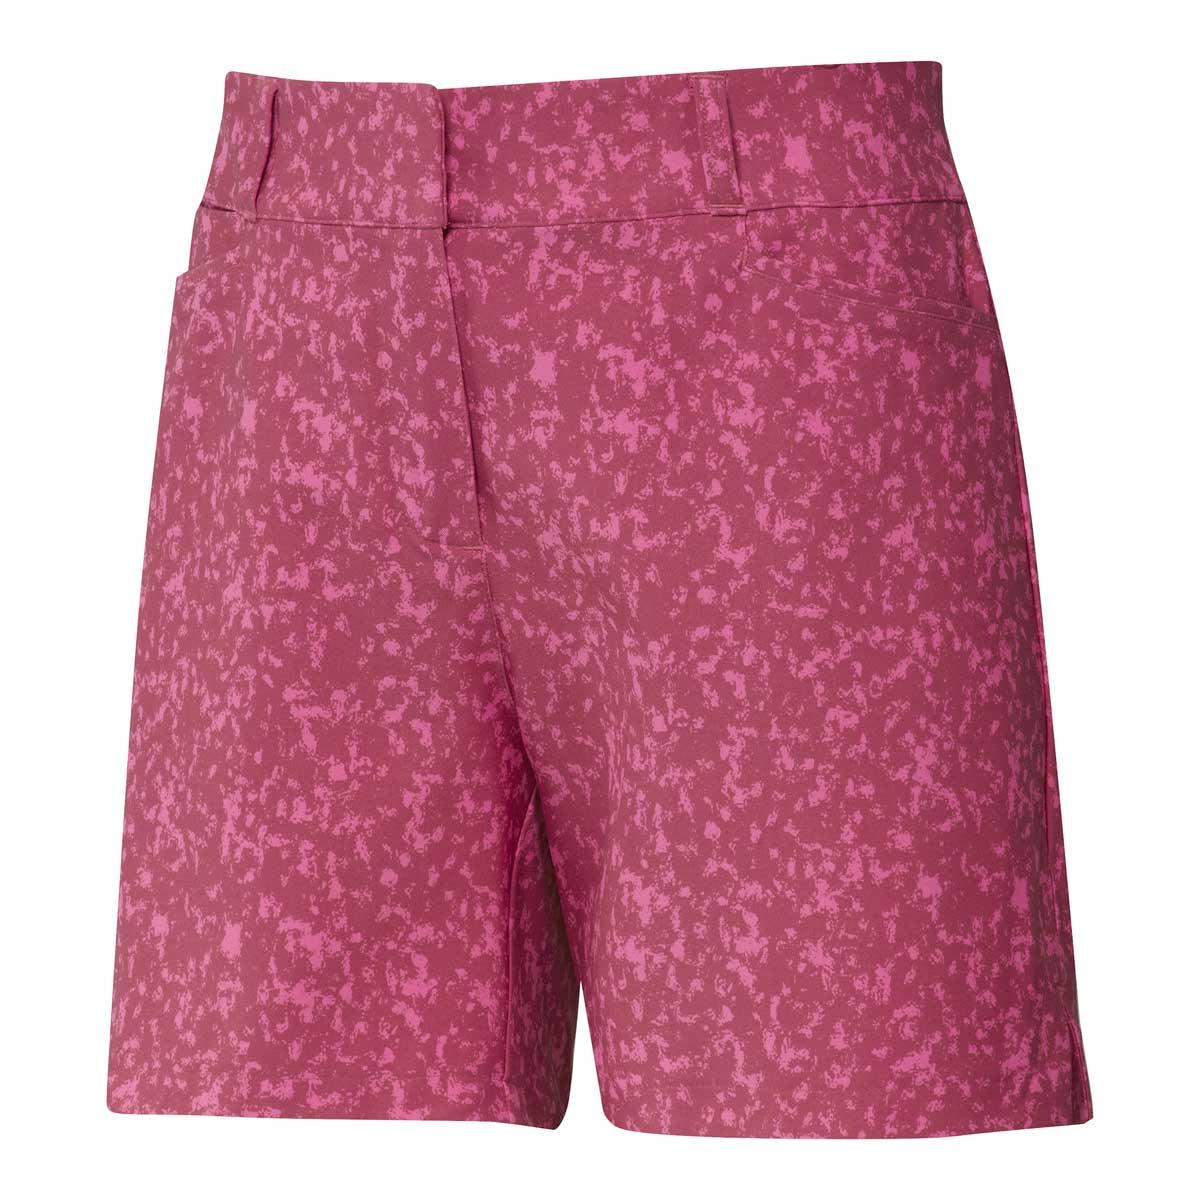 Adidas Women's Printed 5 Inch Wild Pink Short